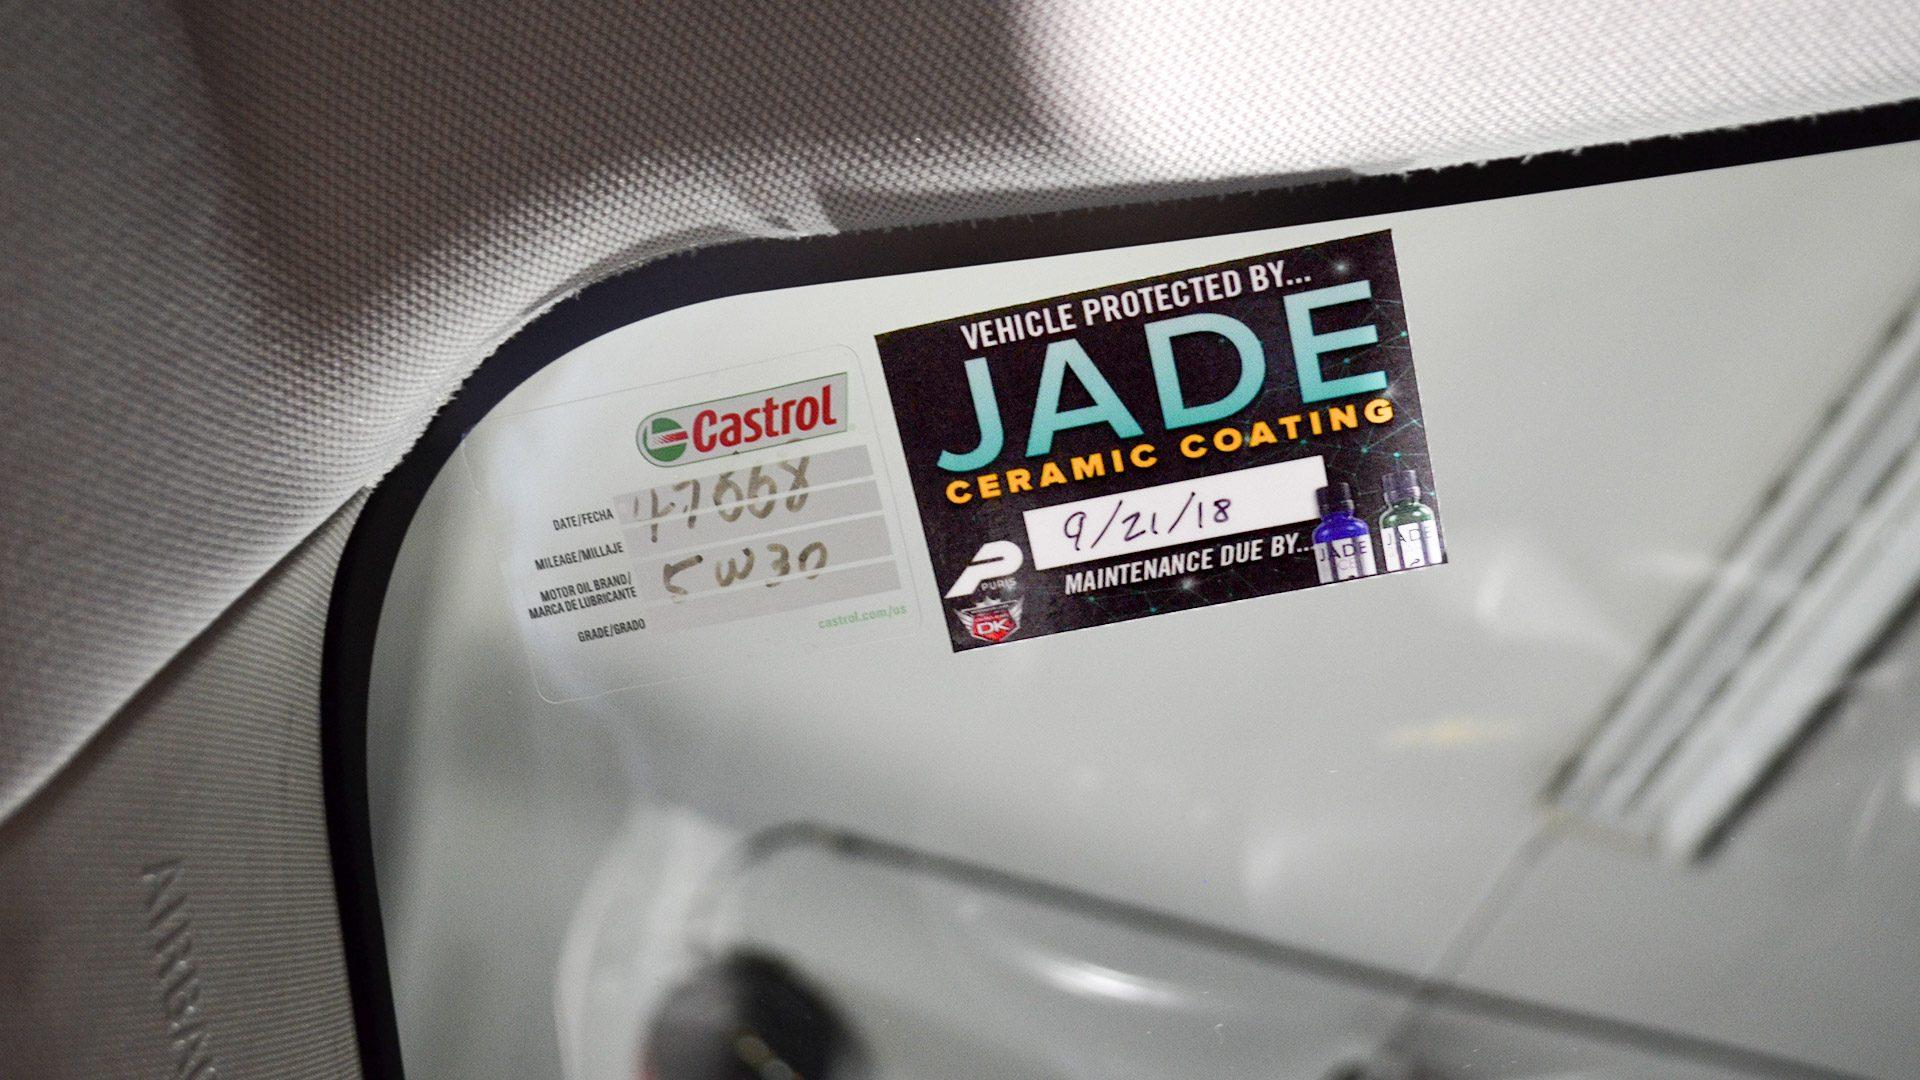 Jade Ceramic Coating Window Cling Stickers